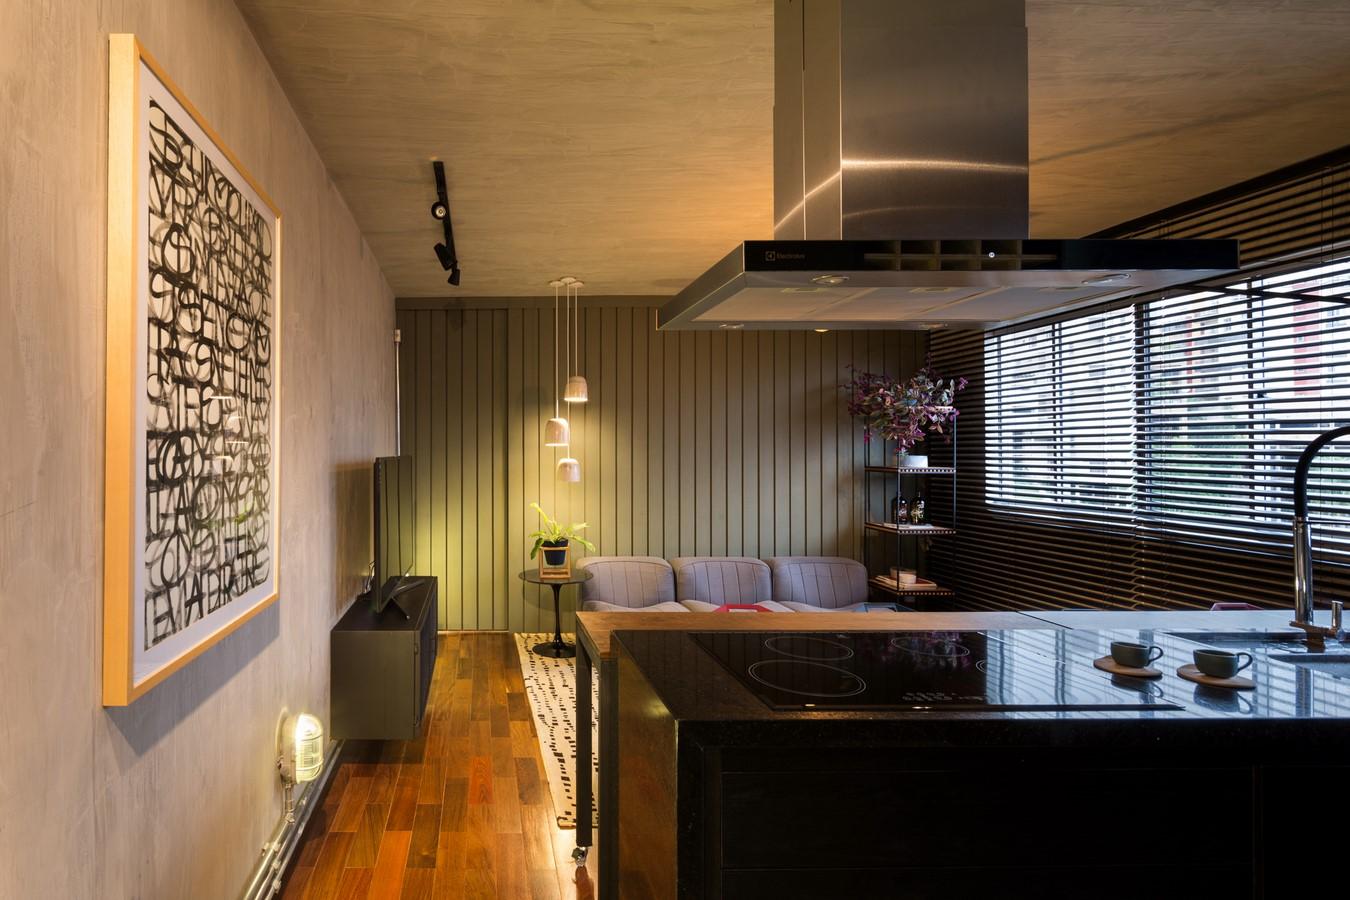 Apartamento Buritis by Pedro Haruf Arquiteto - Sheet1